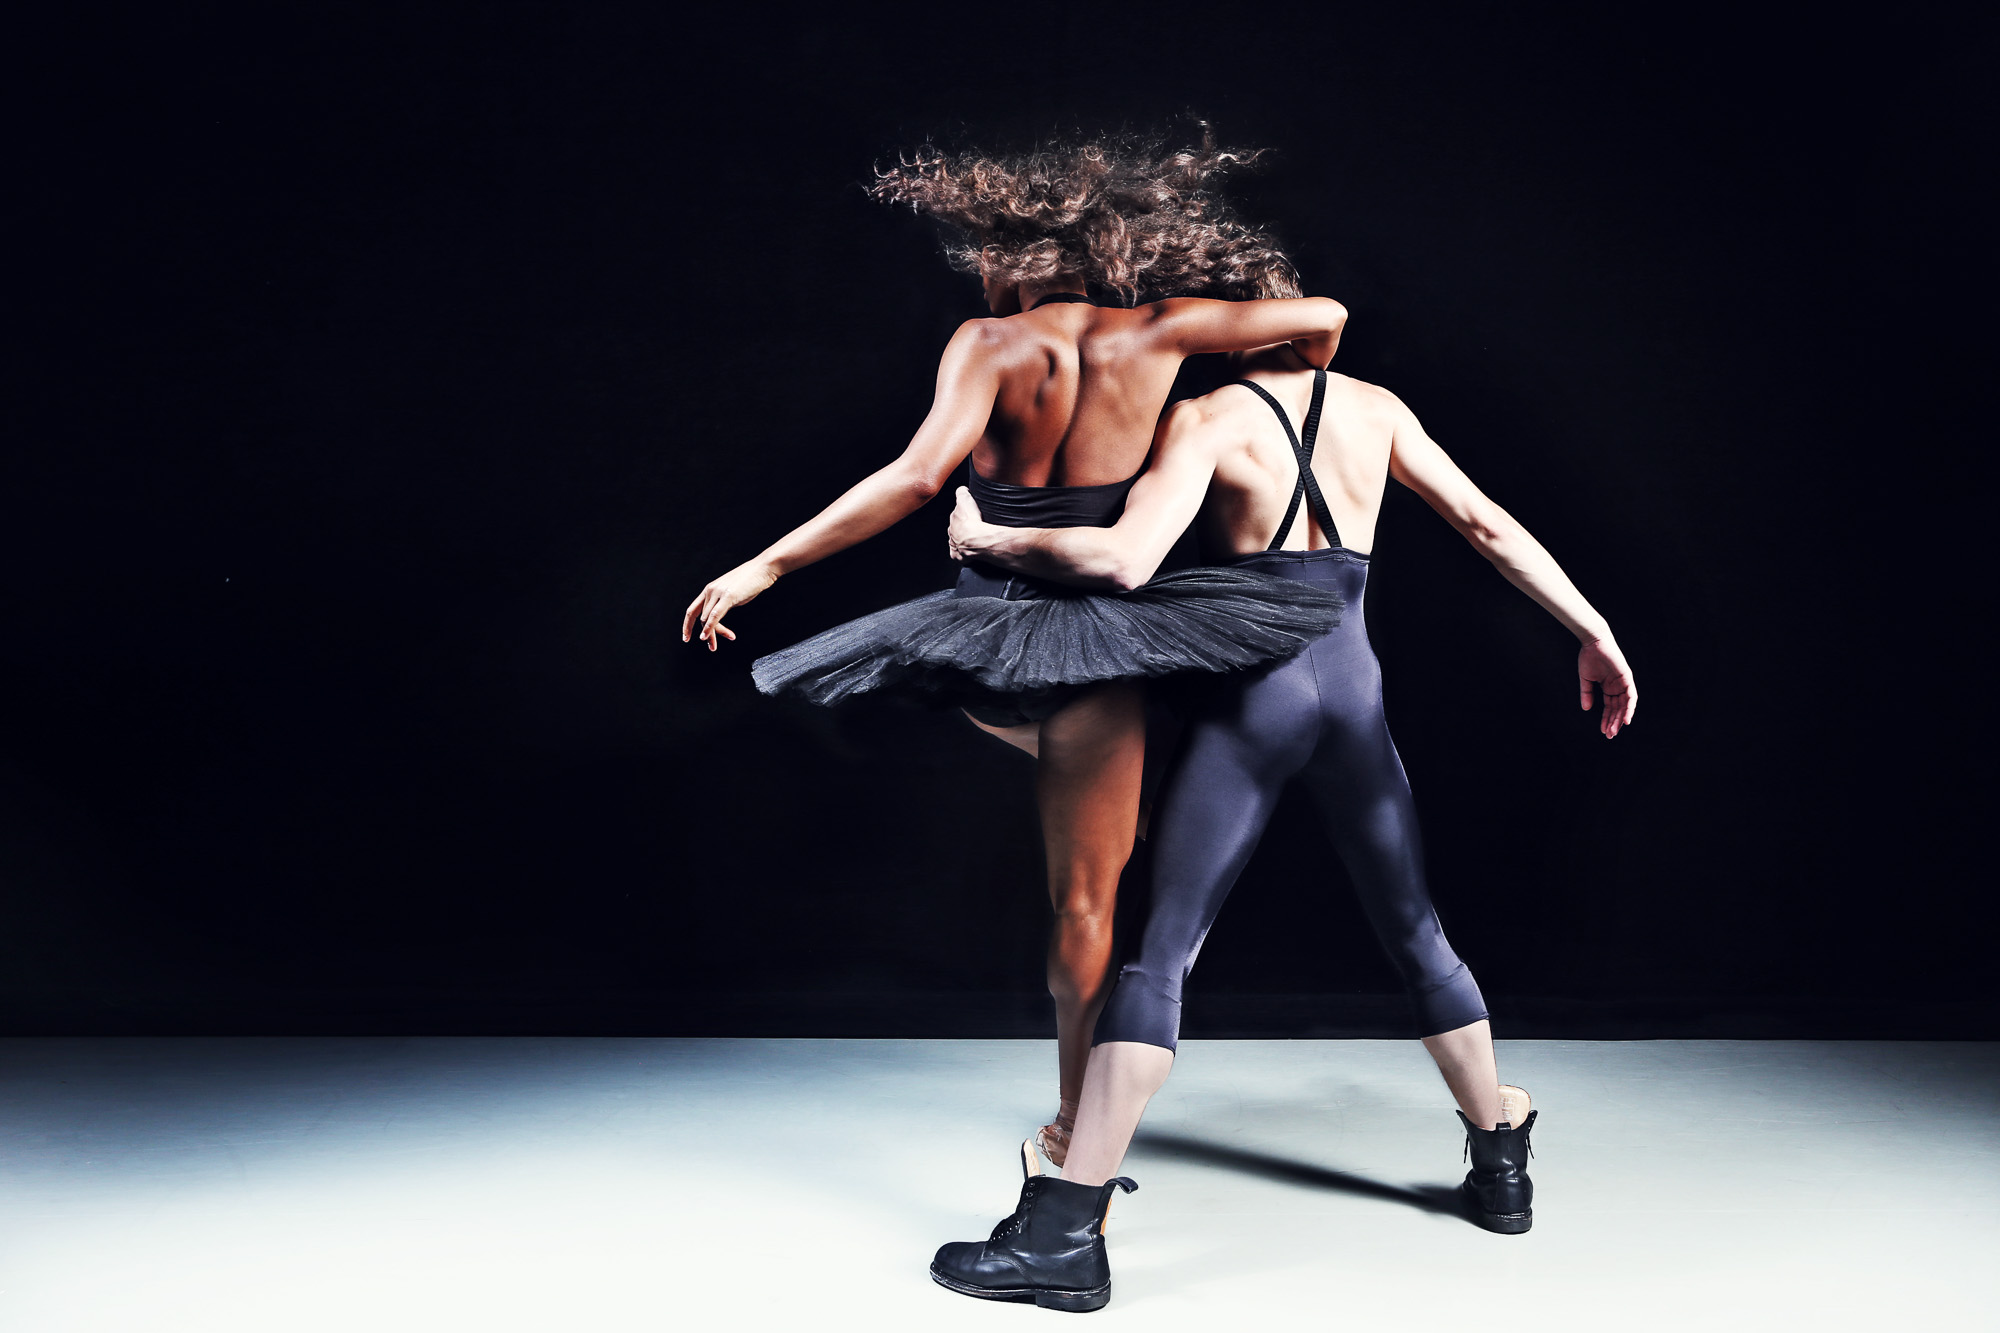 CURTISBROWNPHOTOGRAPHY_DANCE_036.JPG